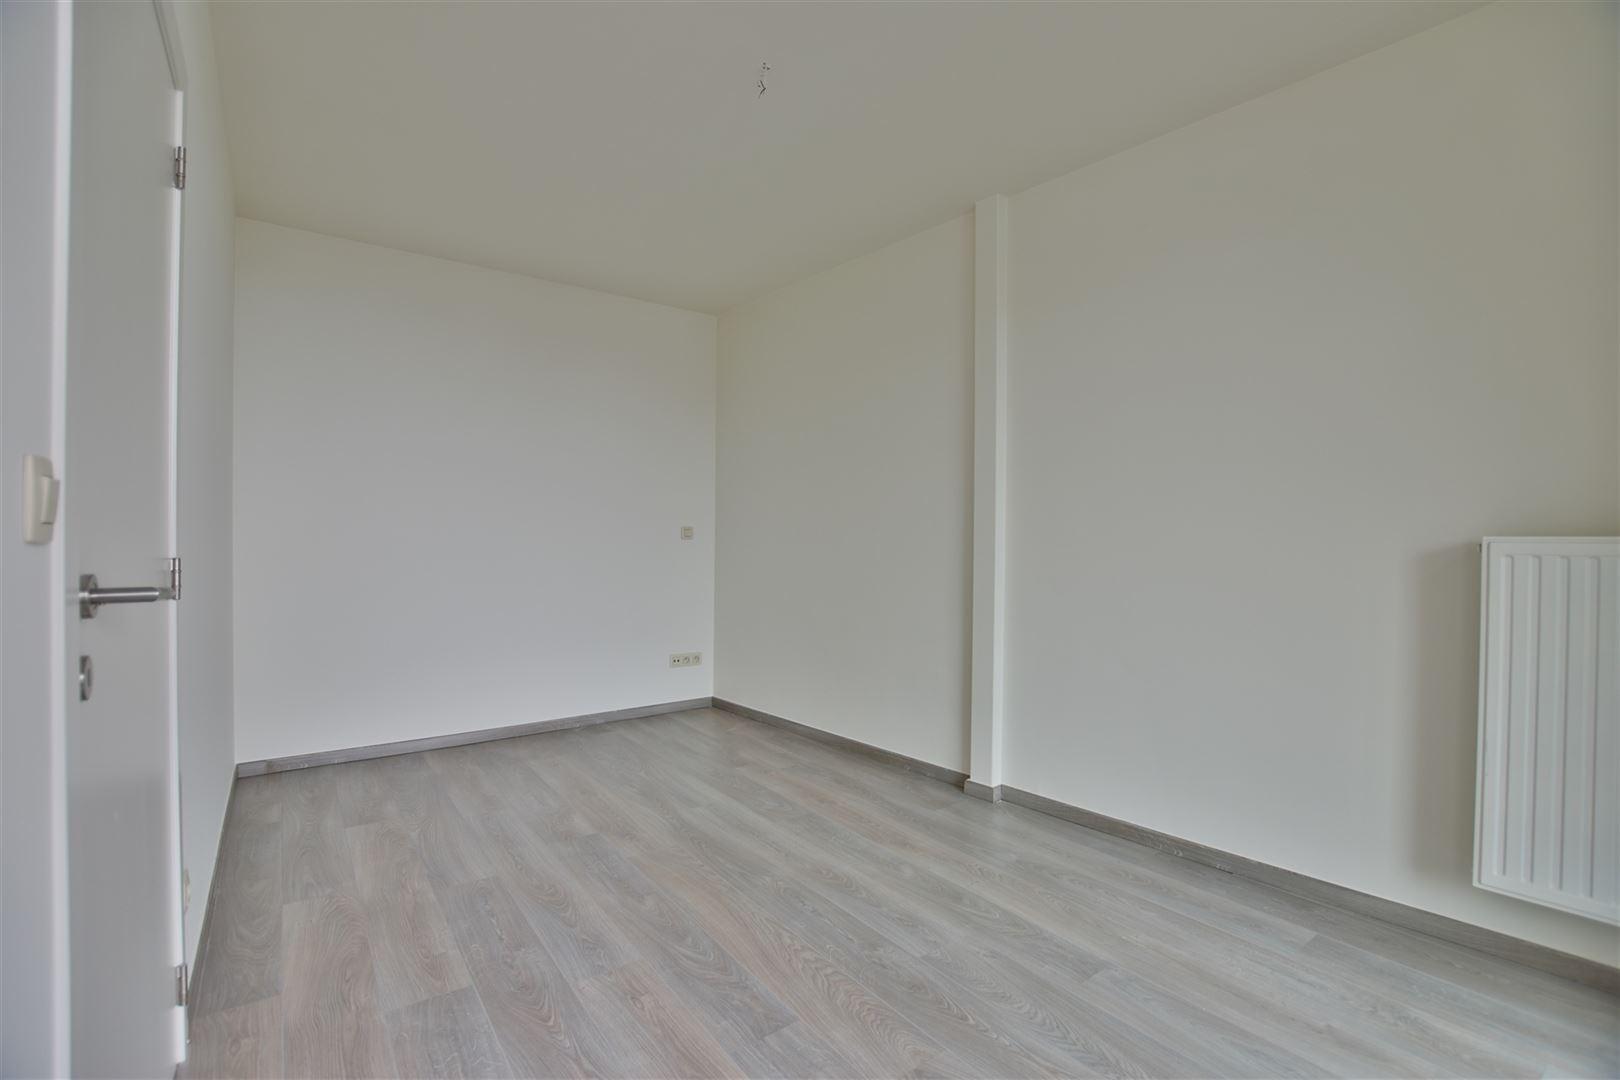 Foto 22 : Duplex/Penthouse te 9200 Sint-Gillis-bij-Dendermonde (België) - Prijs € 278.000